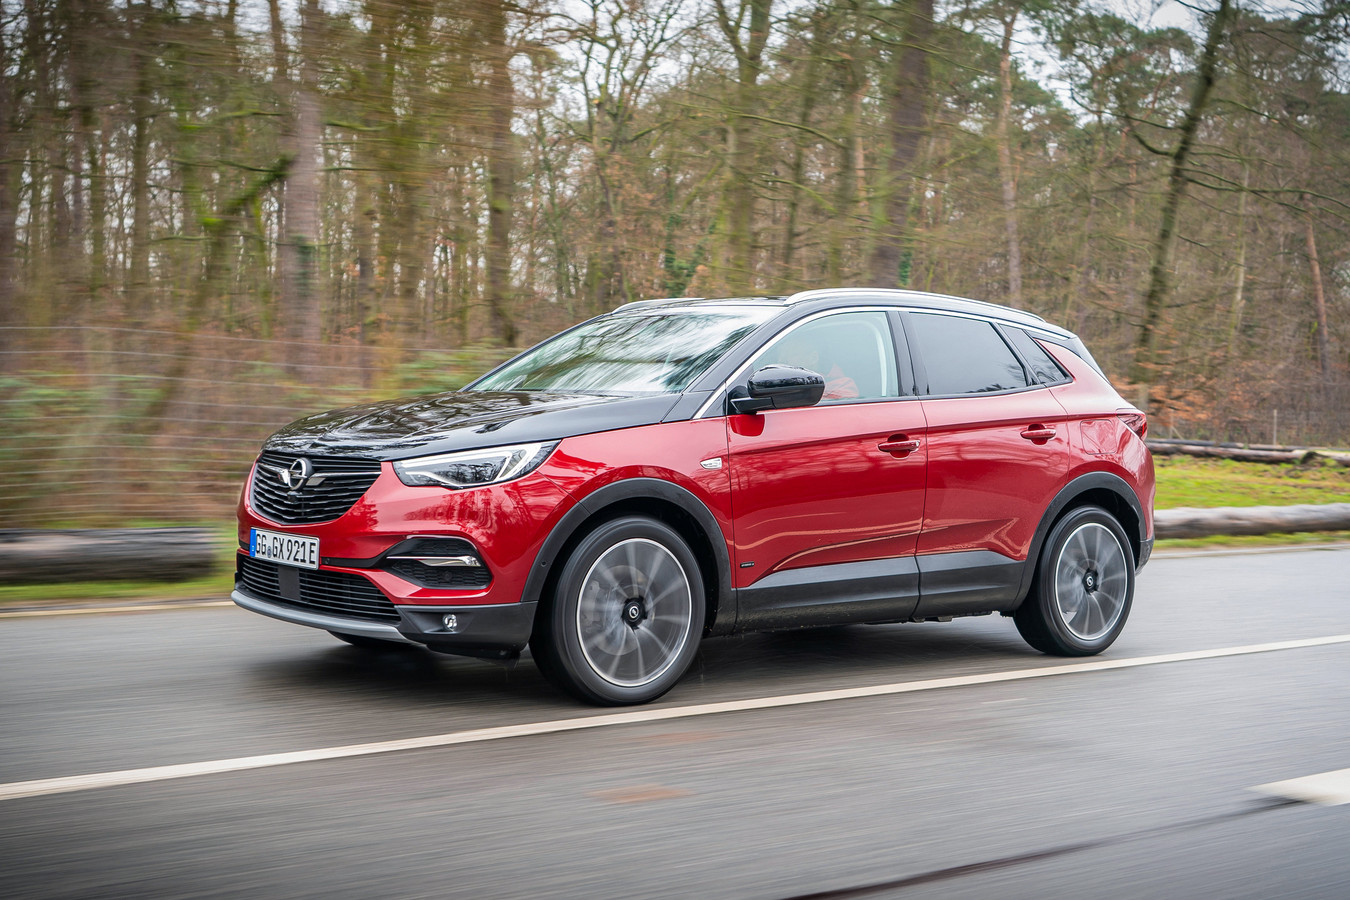 De nieuwe Opel Grandland X Hybrid4 is fluisterstil én razendsnel.